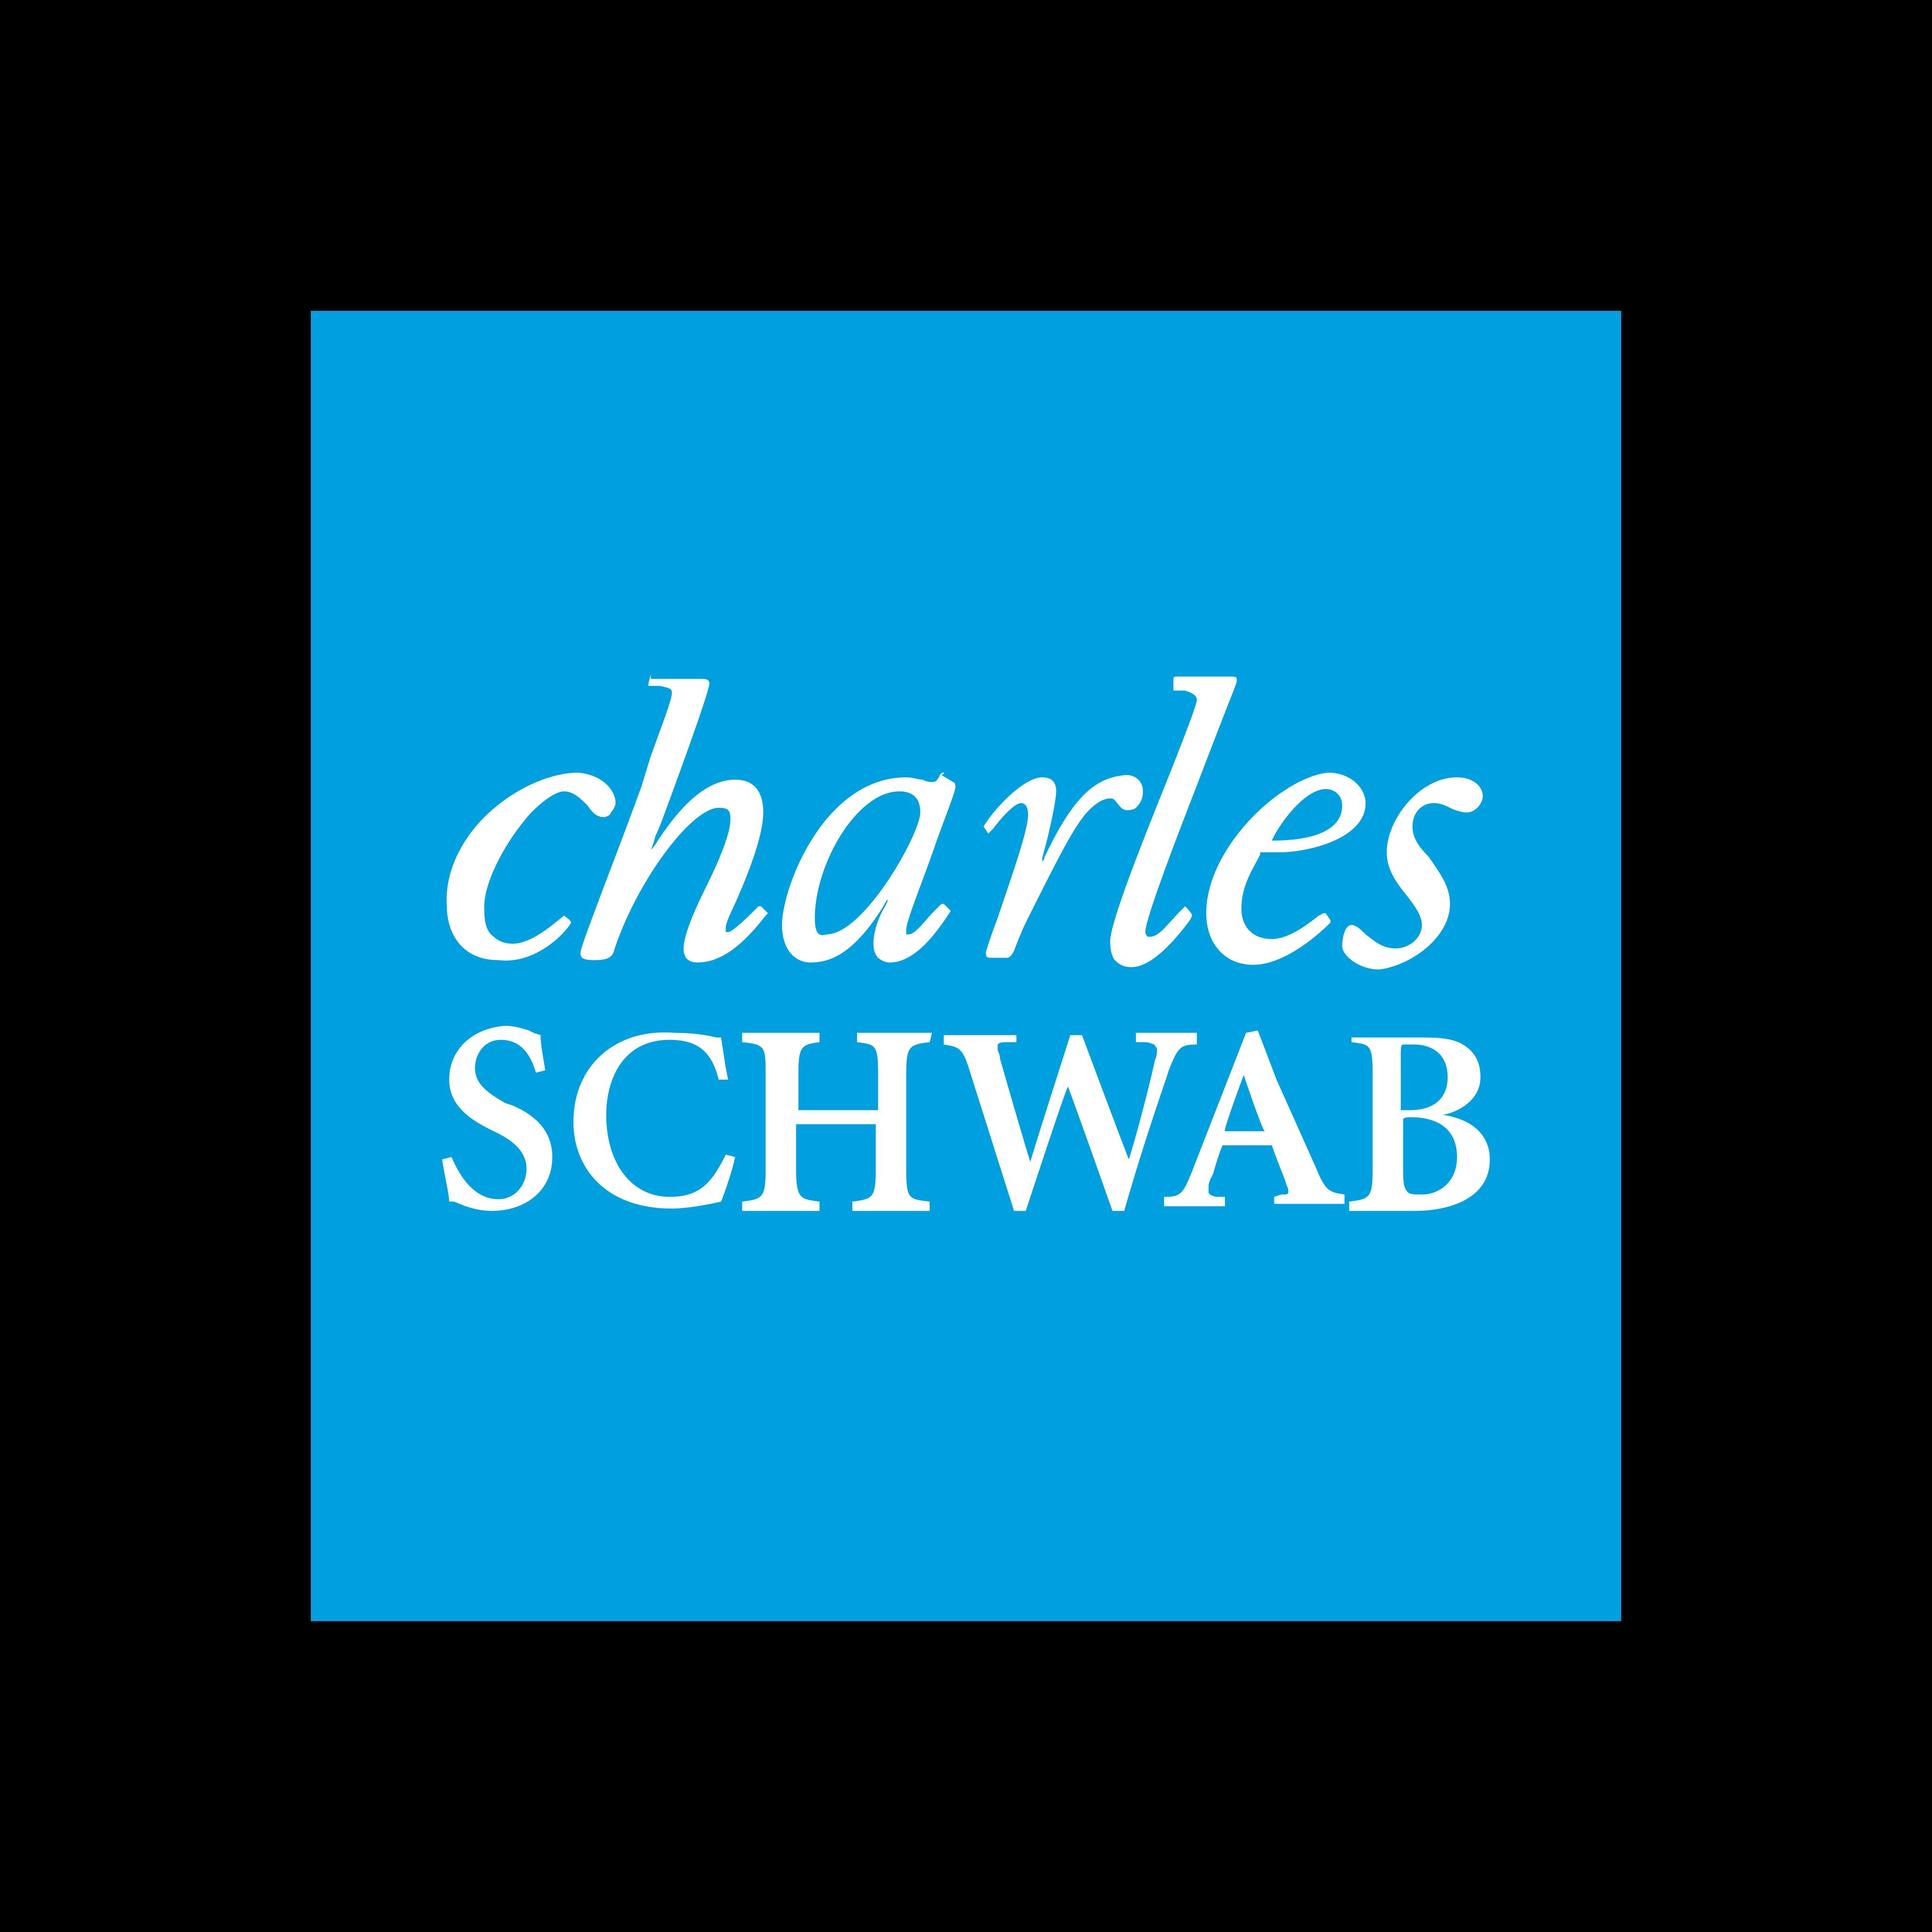 charles schwab logo 0 - Charles Schwab Logo